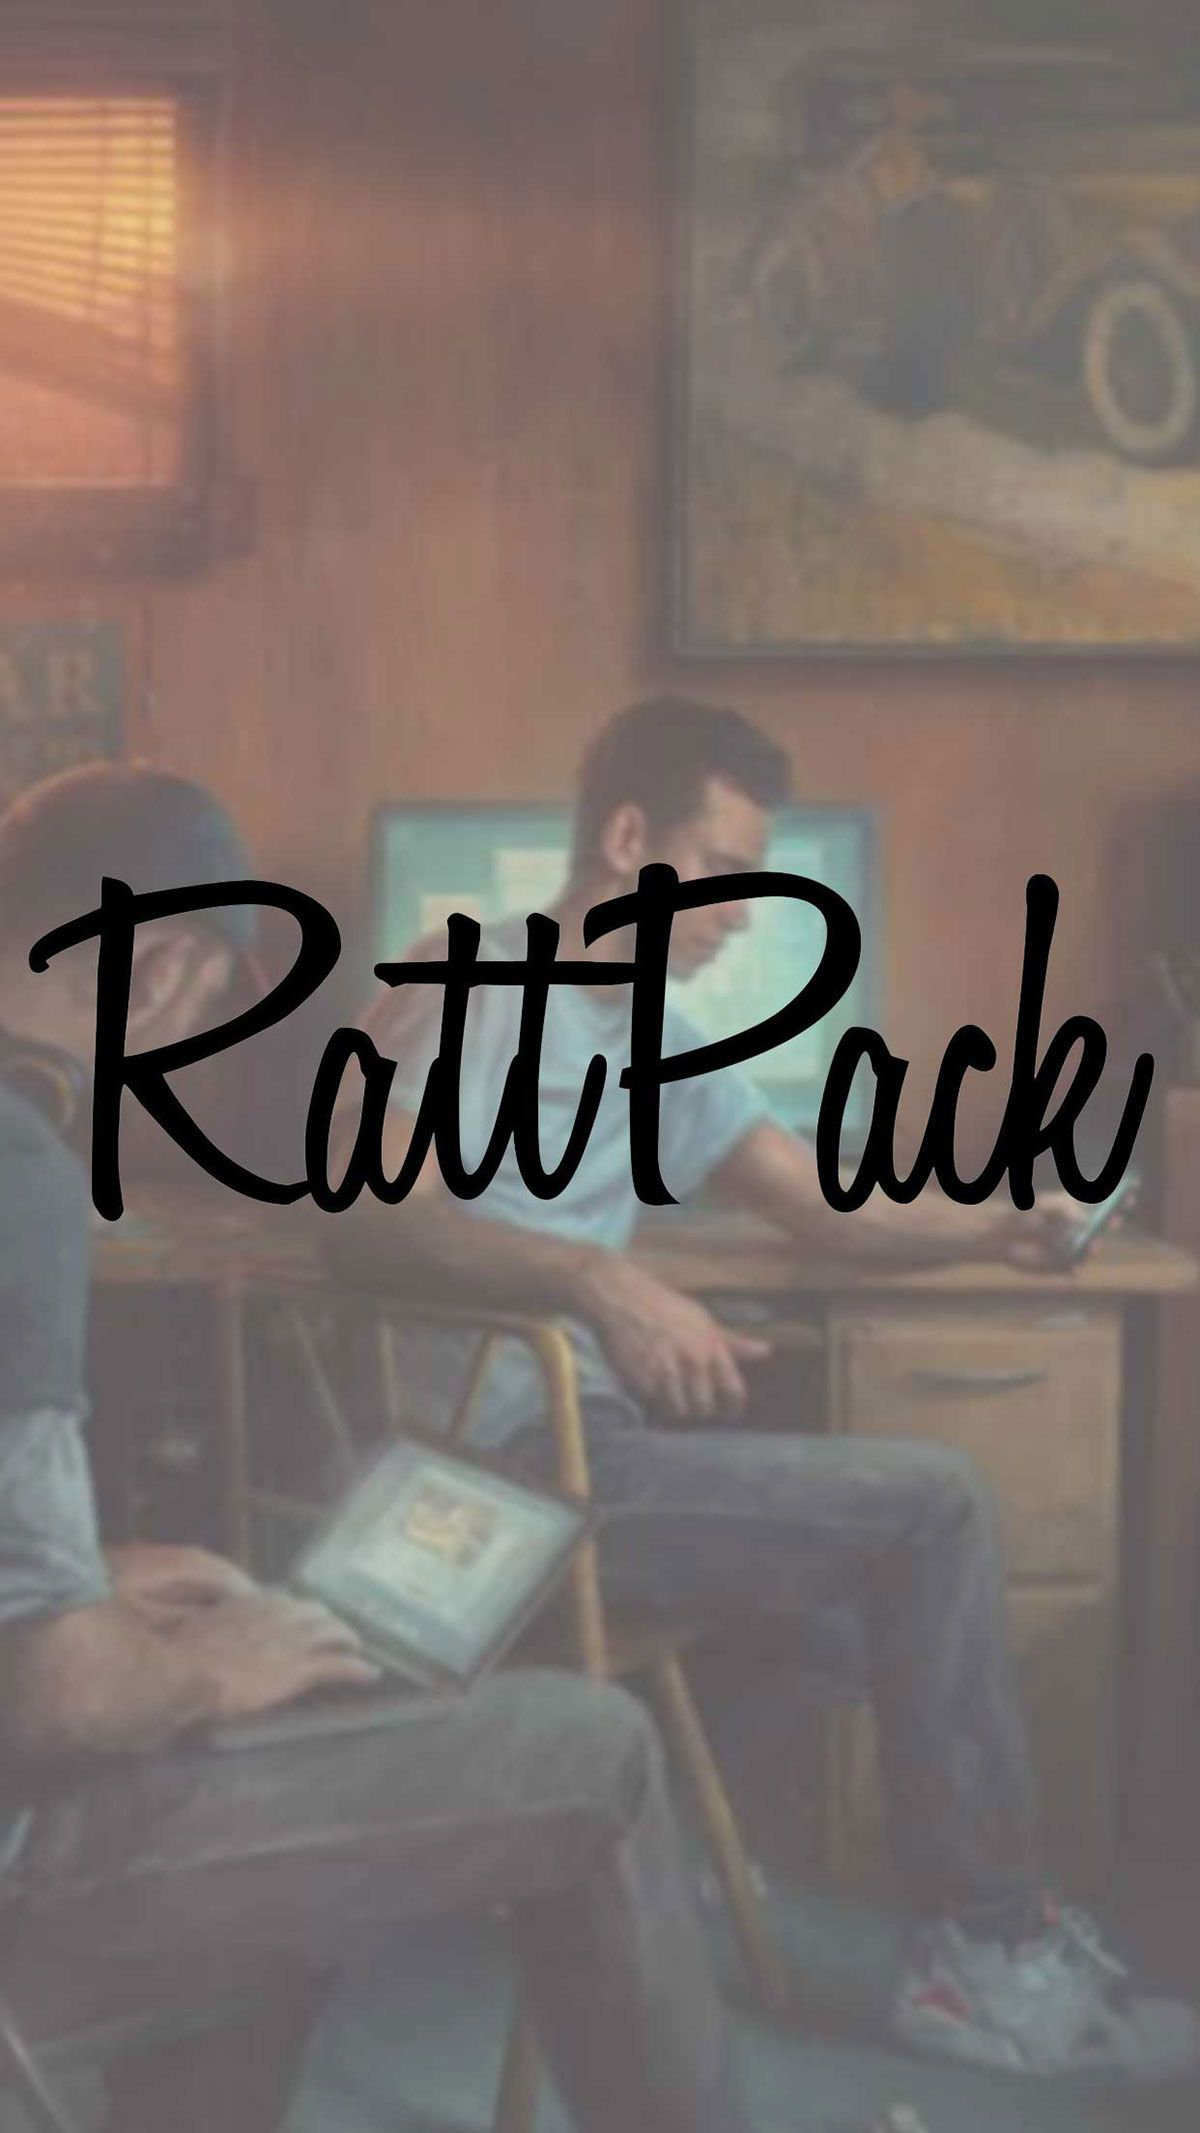 Rattpack IPhone 6 Plus Wallpaper UnderPressure Logic On Behance